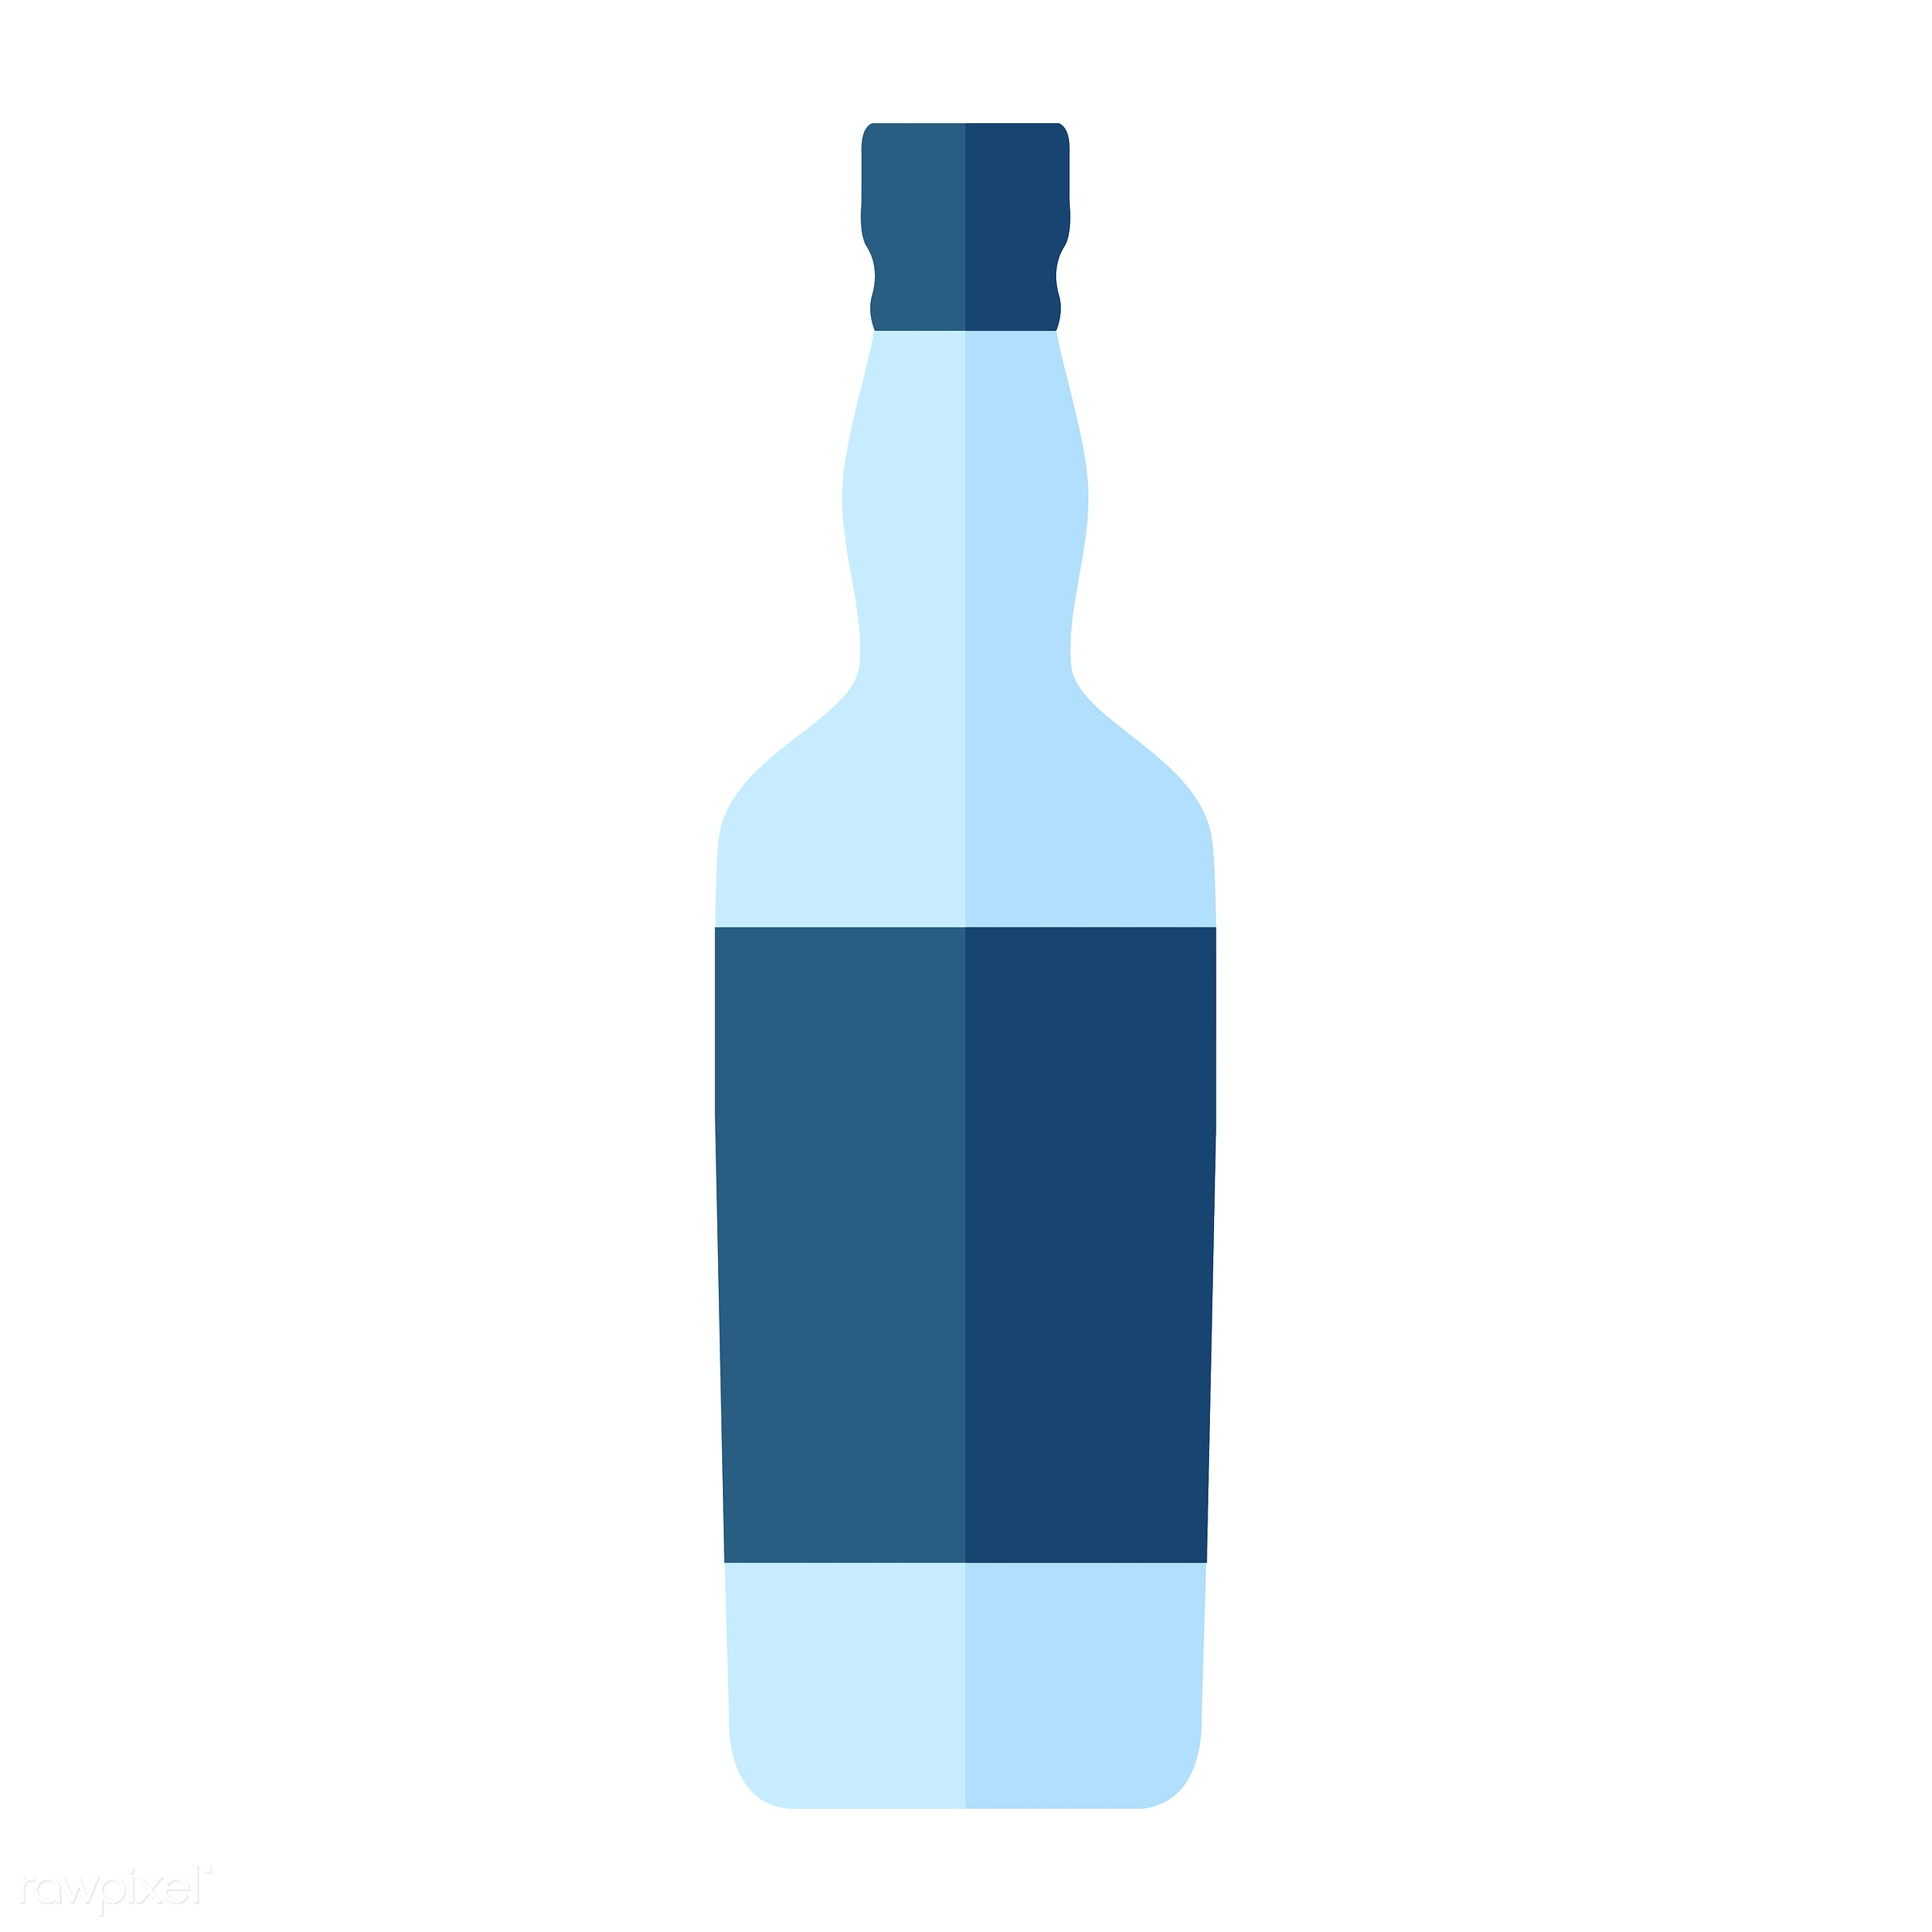 Liquor bottle vector - vector, graphic, illustration, icon, symbol, colorful, cute, drink, beverage, water, liquor, vodka,...